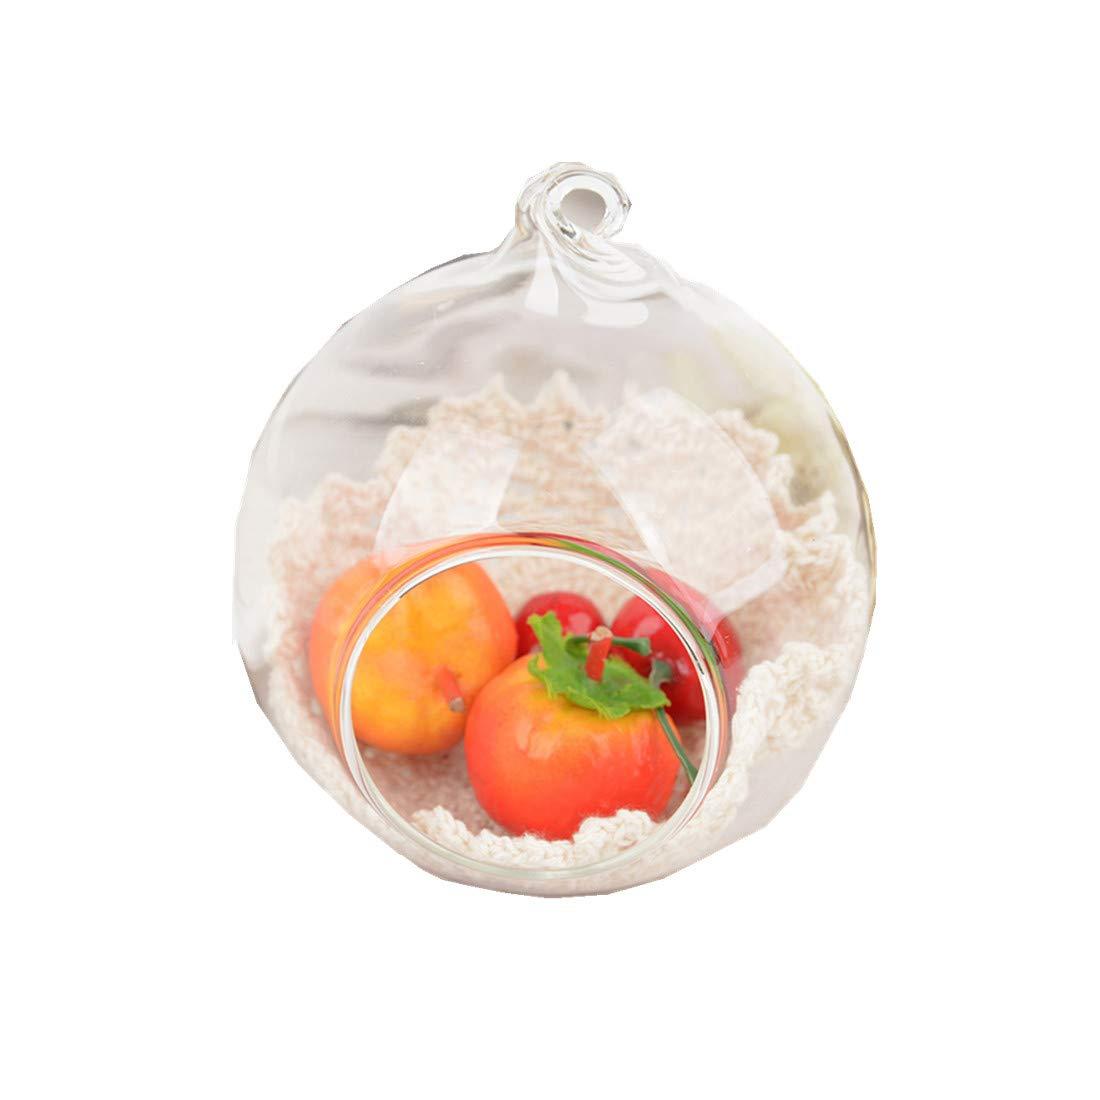 JPOQW Crystal Glass Candlestick Vase Bracket Hanging Candle Holder Home Wedding Party Dinner Decor (Clear, 8cm)